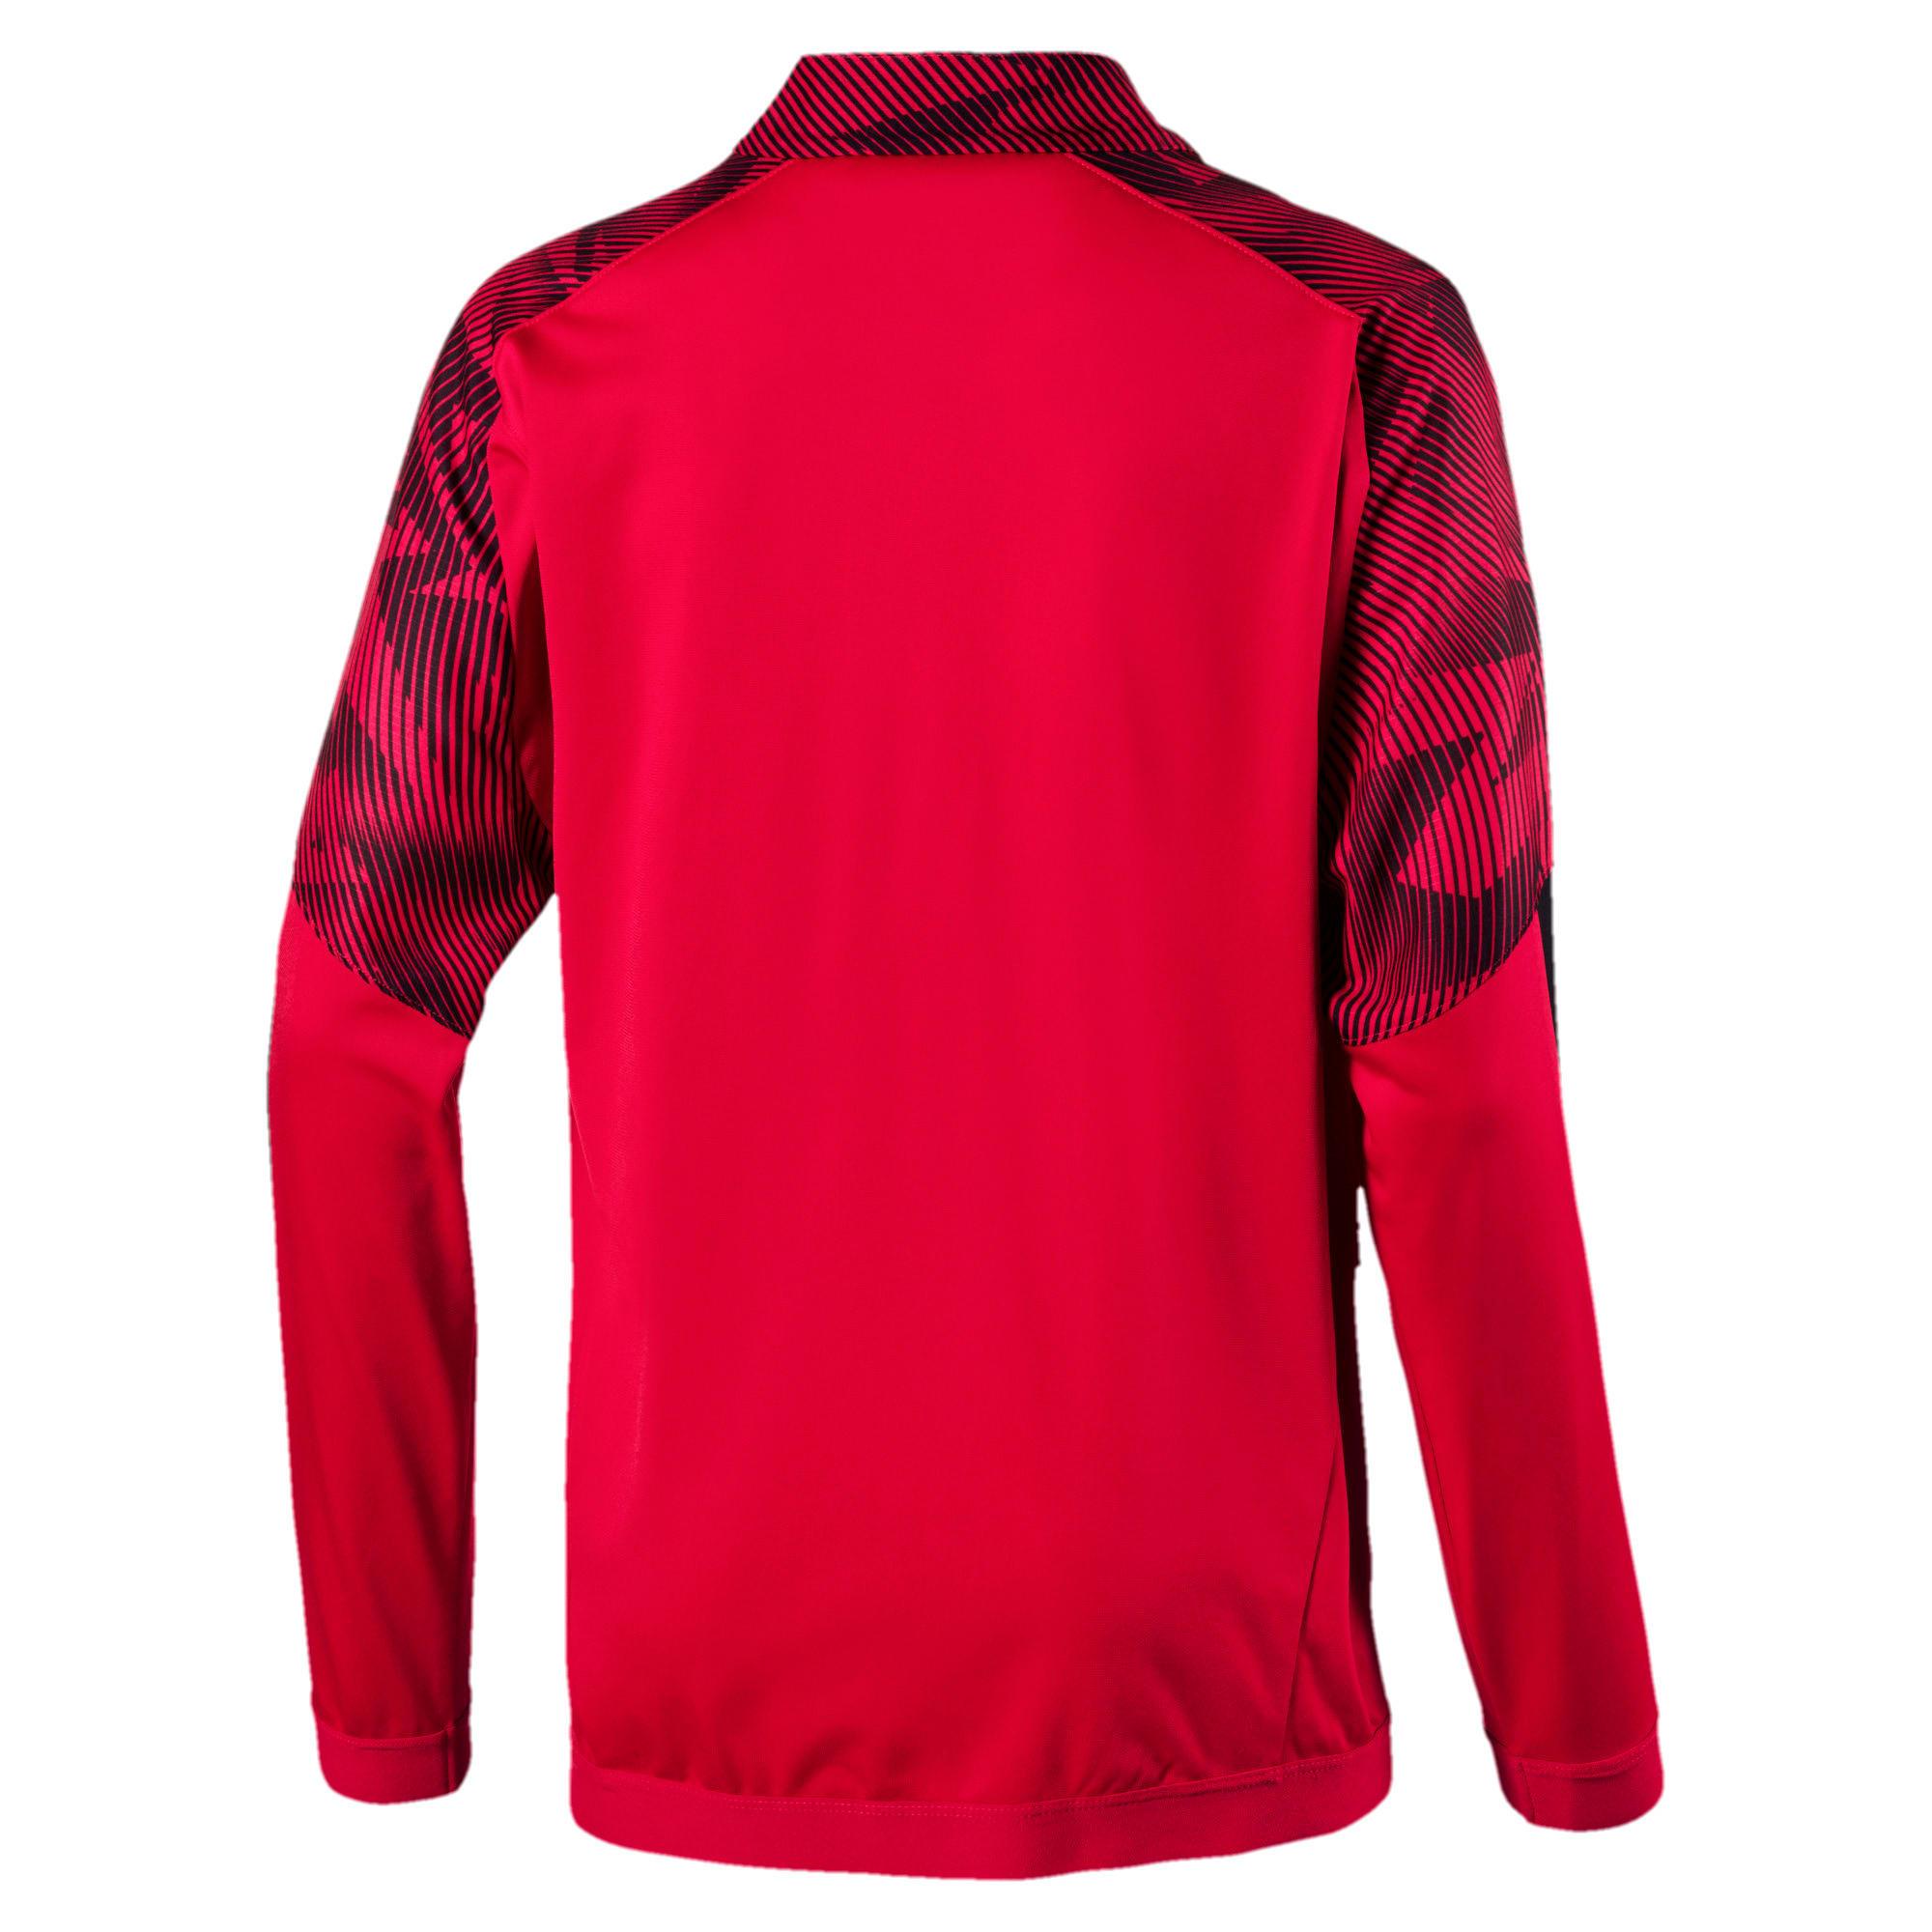 Thumbnail 2 of Blouson AC Milan Poly pour garçon, Tango Red -Puma Black, medium